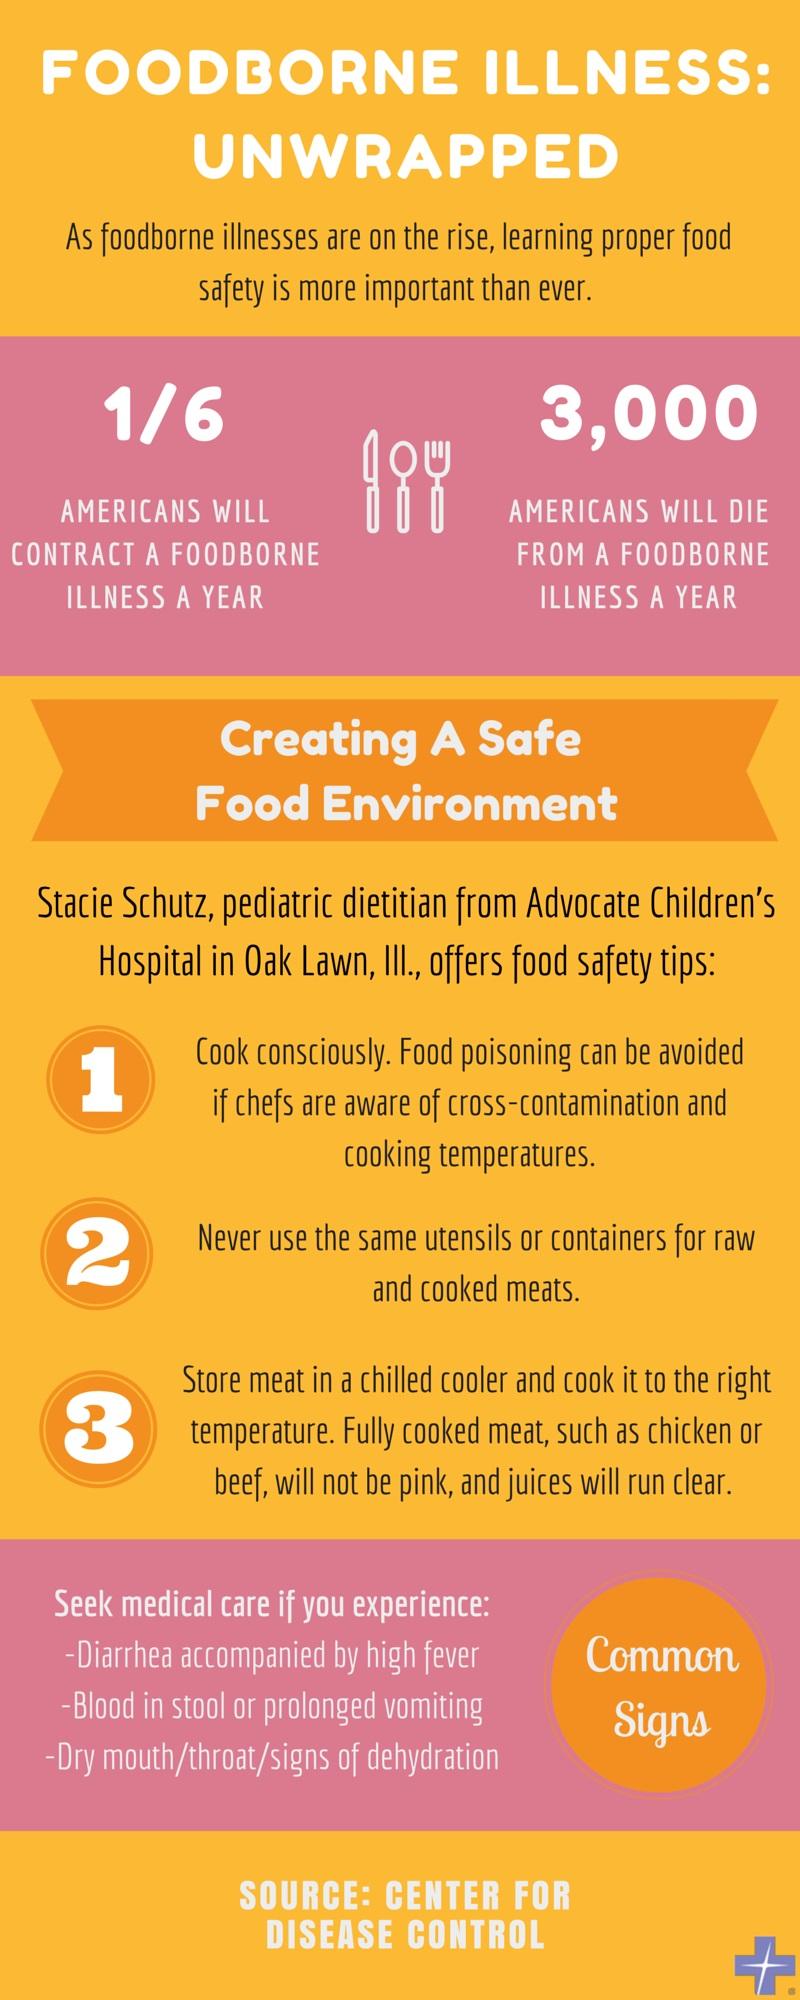 Foodbourne Illness infographic